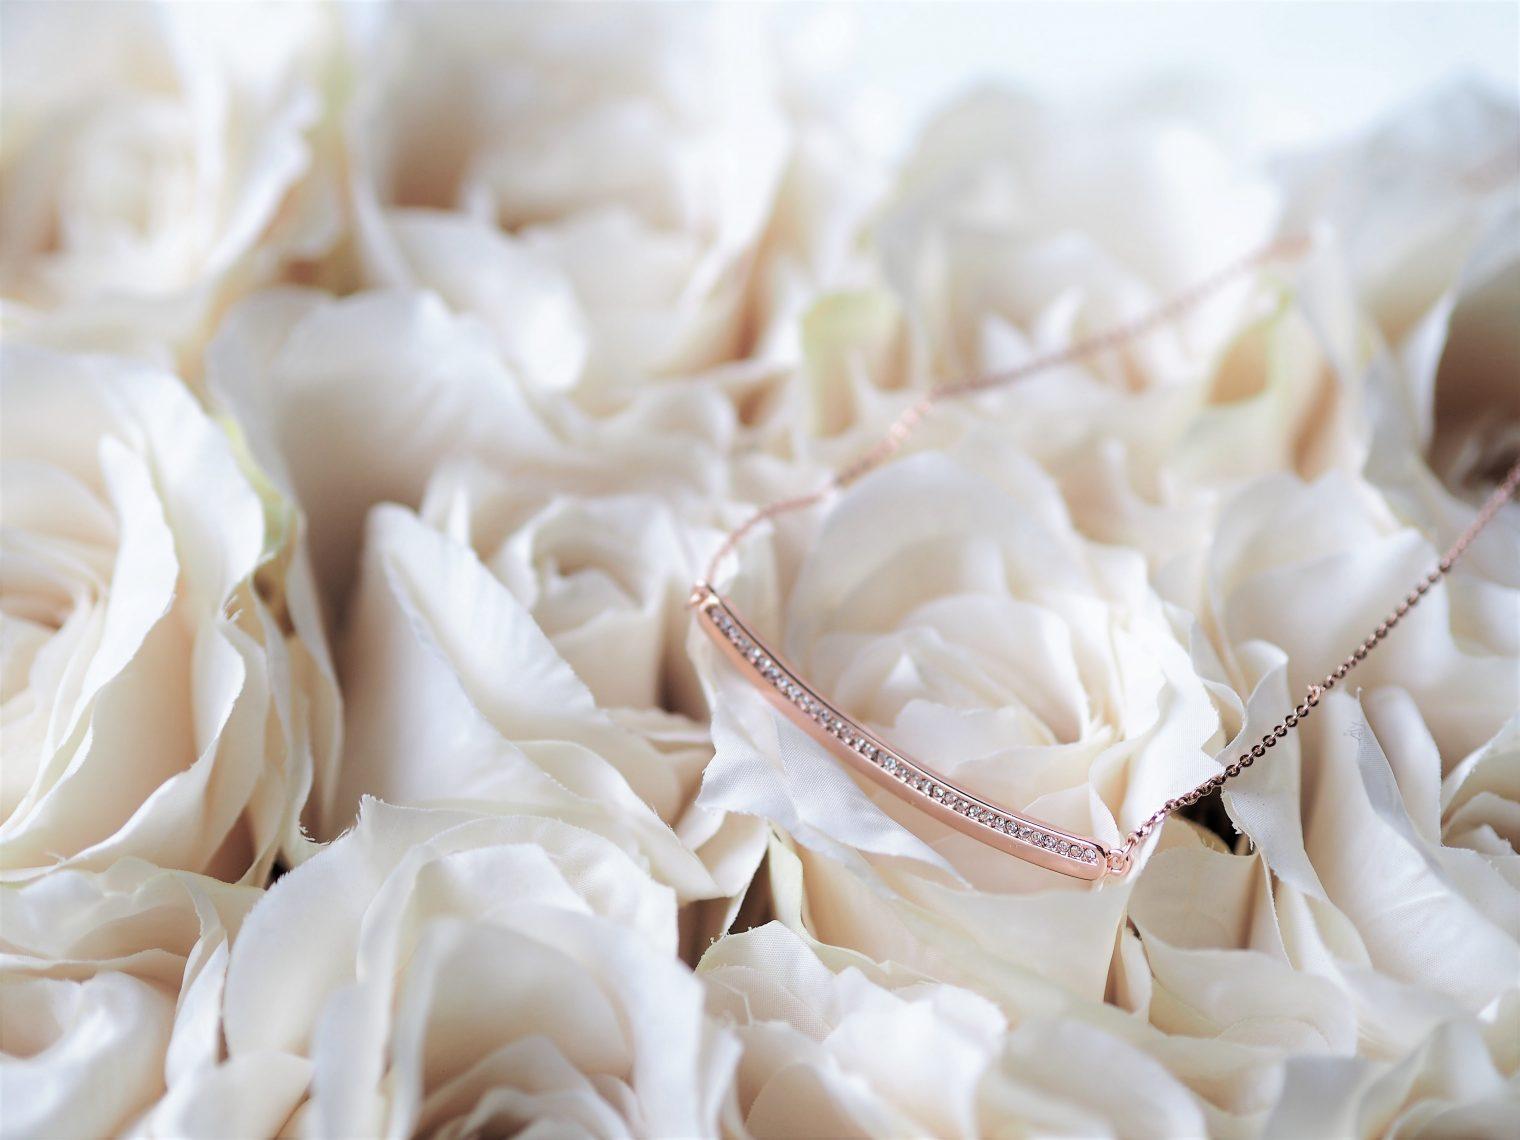 Kaytie Wu rose gold necklace with Swarovski crystals